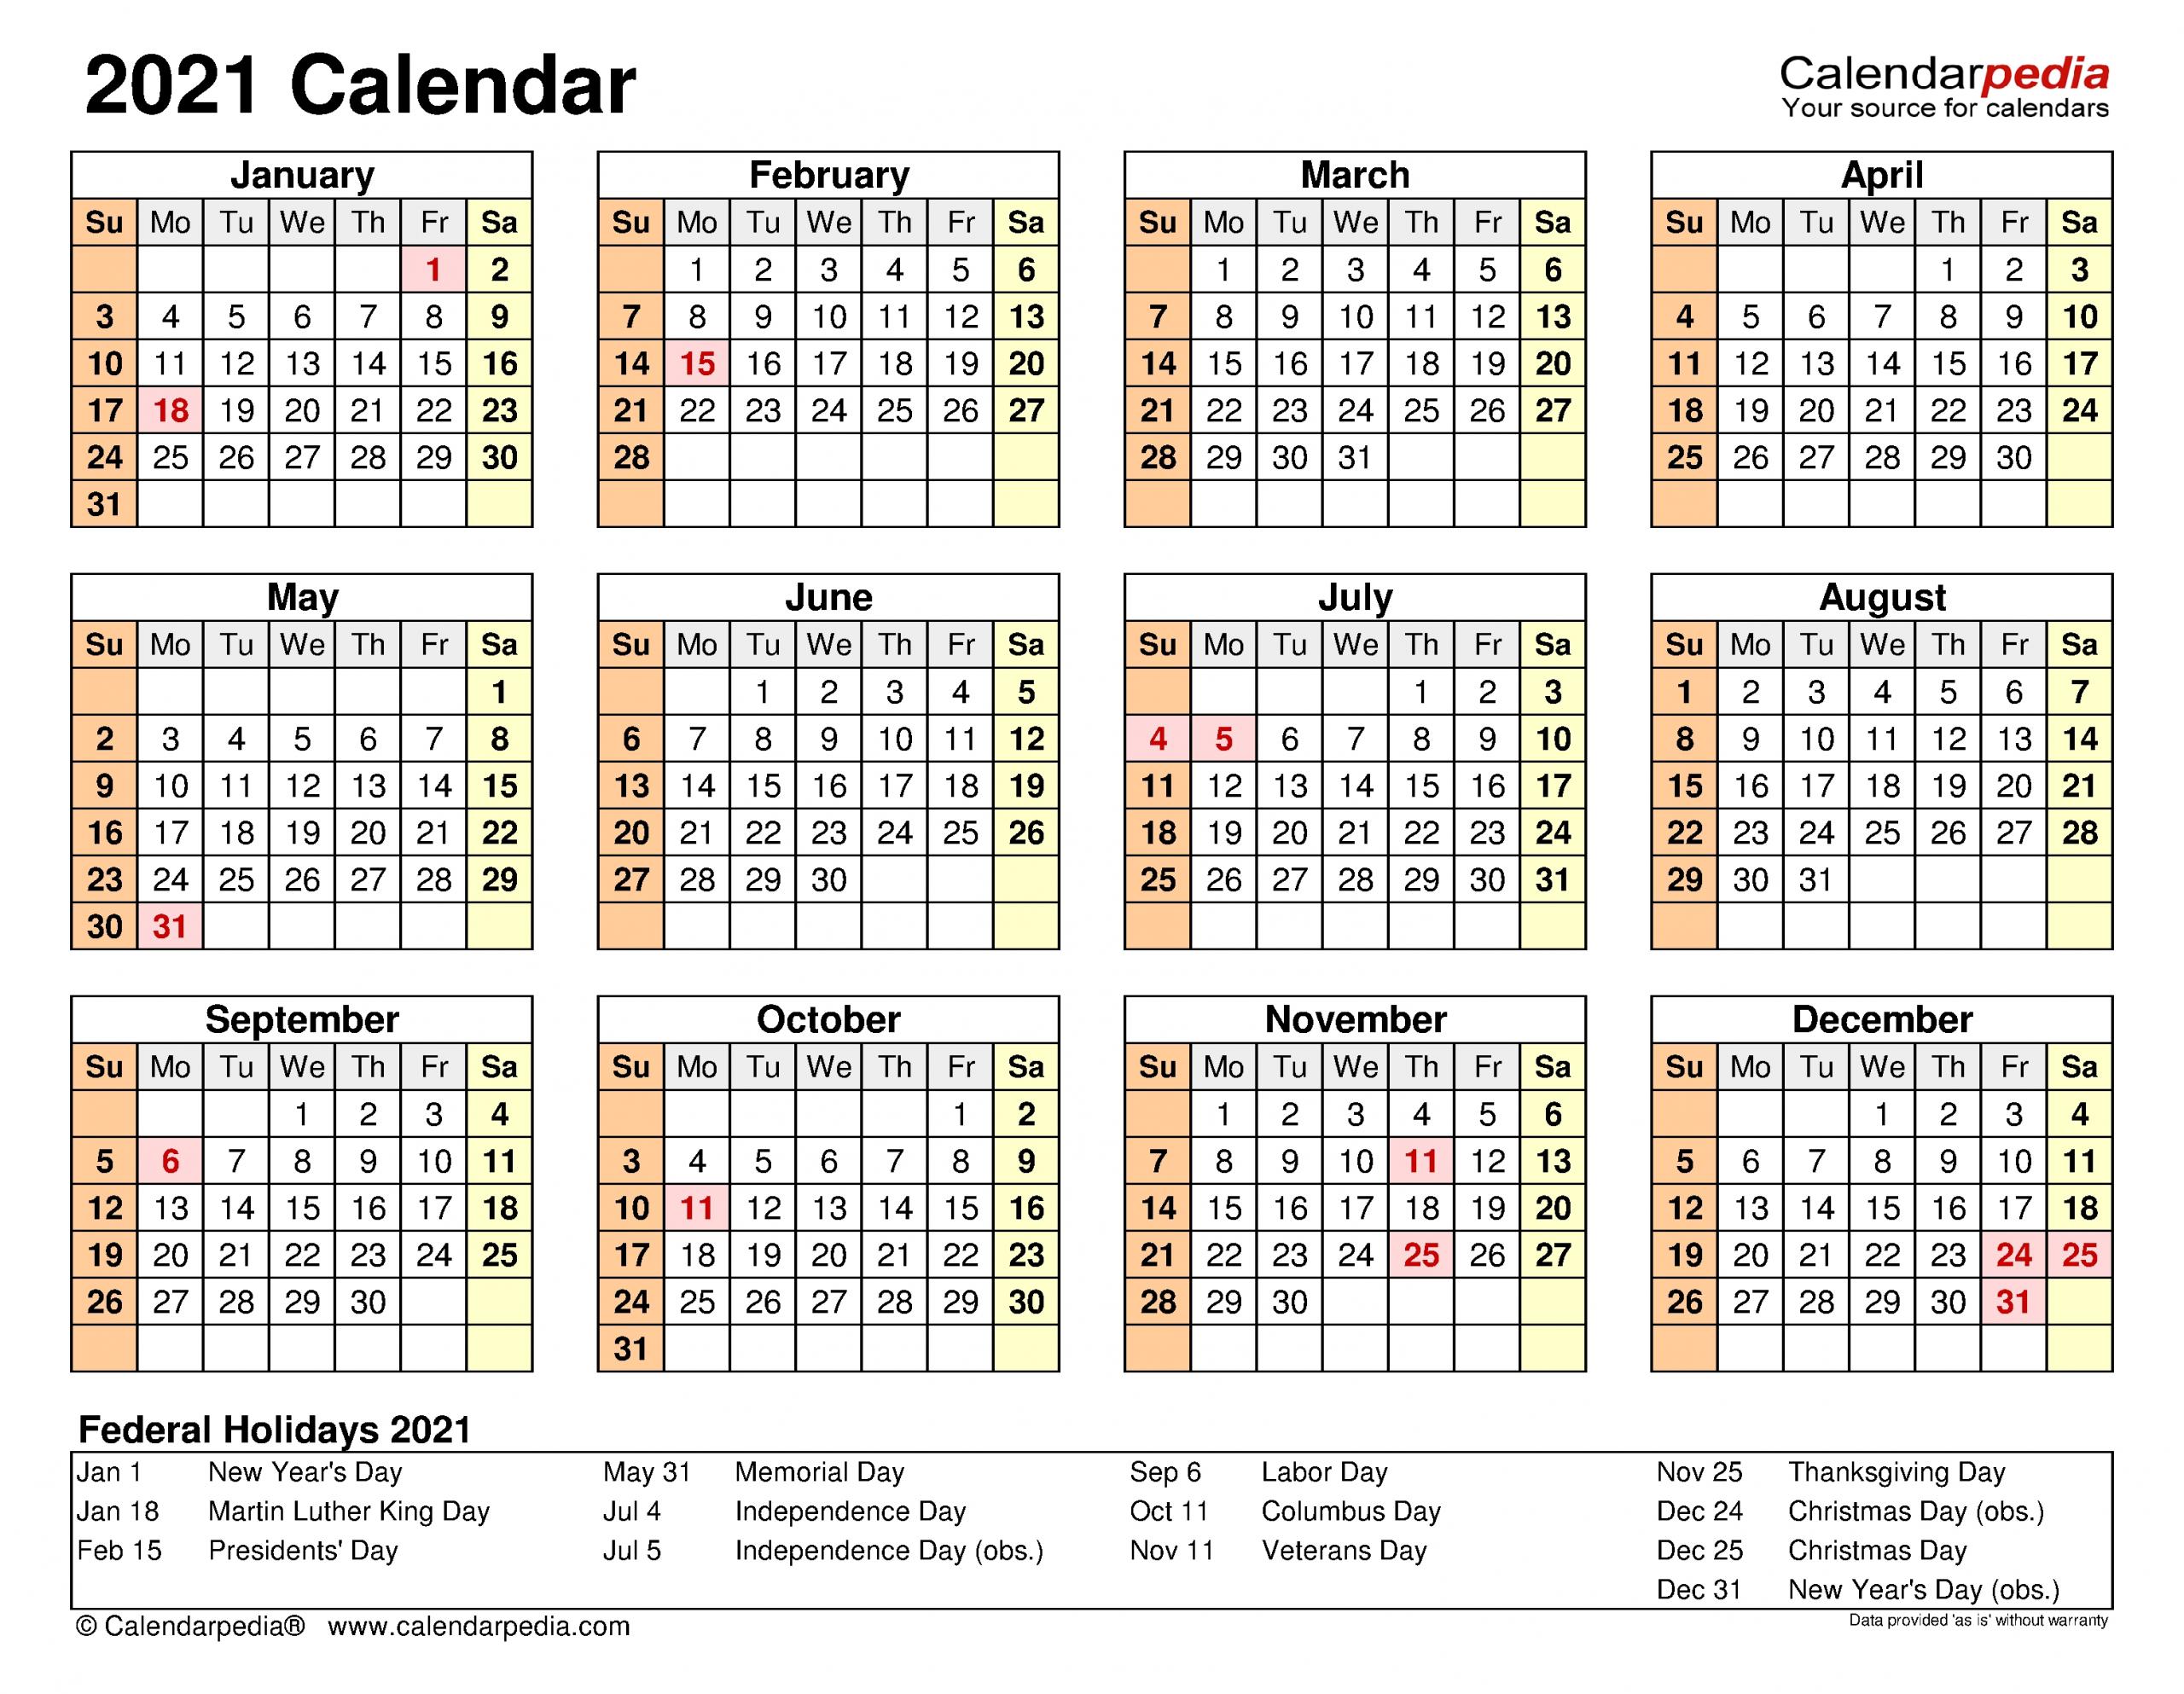 2021 Calendar - Free Printable Word Templates - Calendarpedia